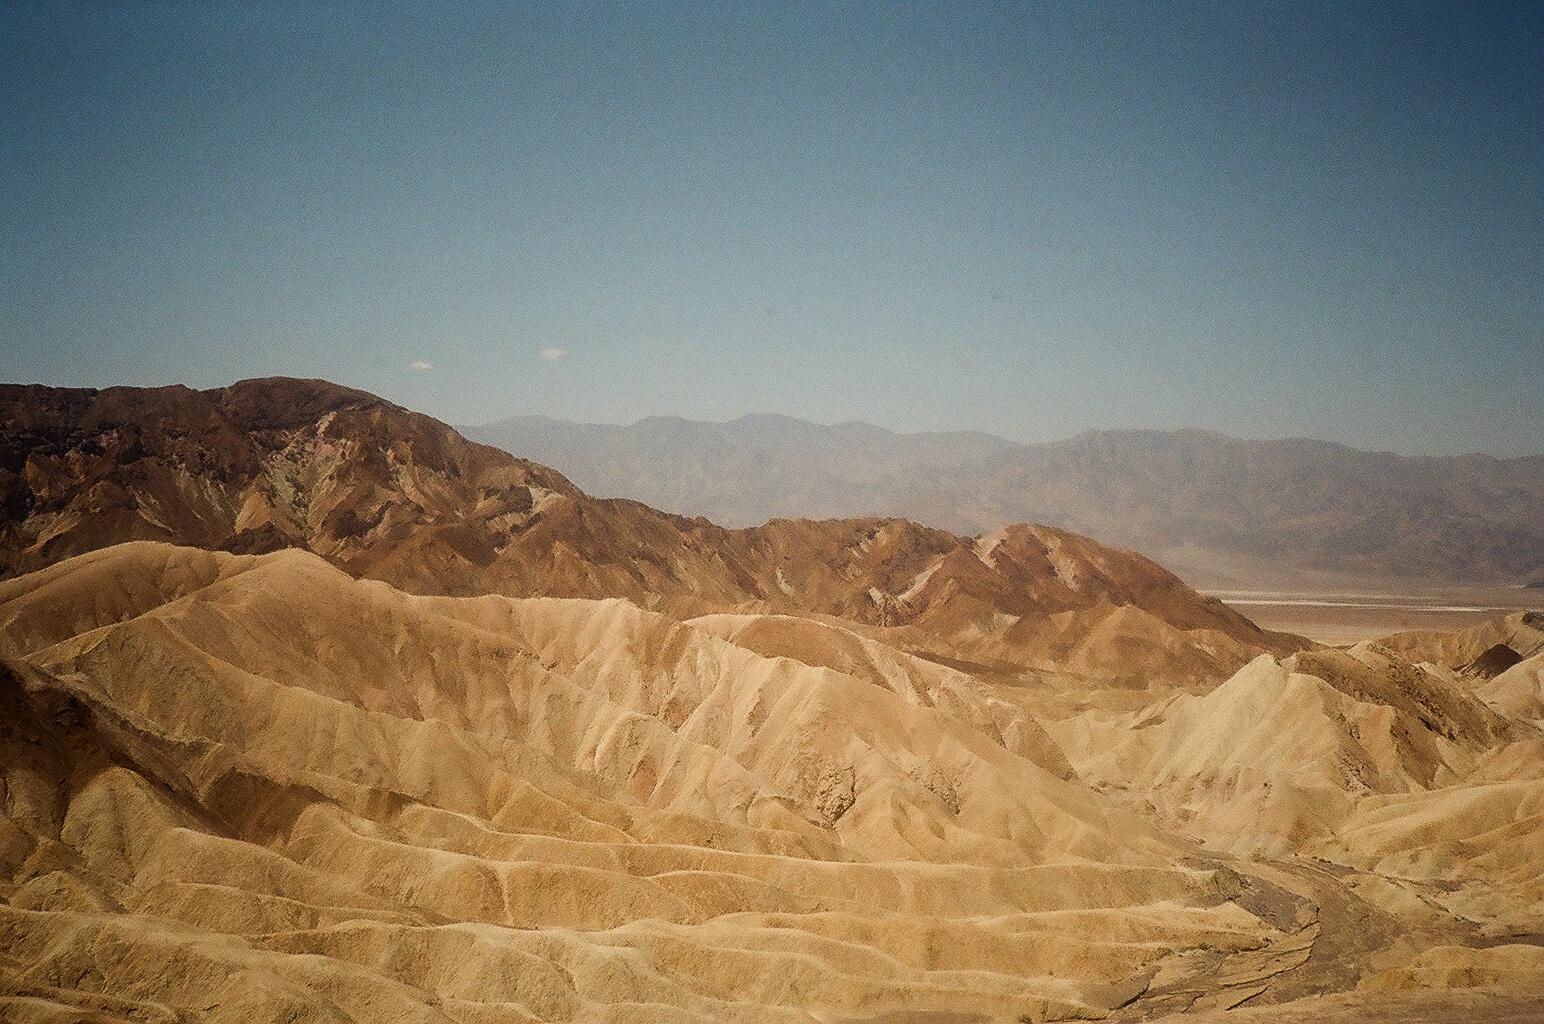 isabella pojuner  death valley, USA  august 2017